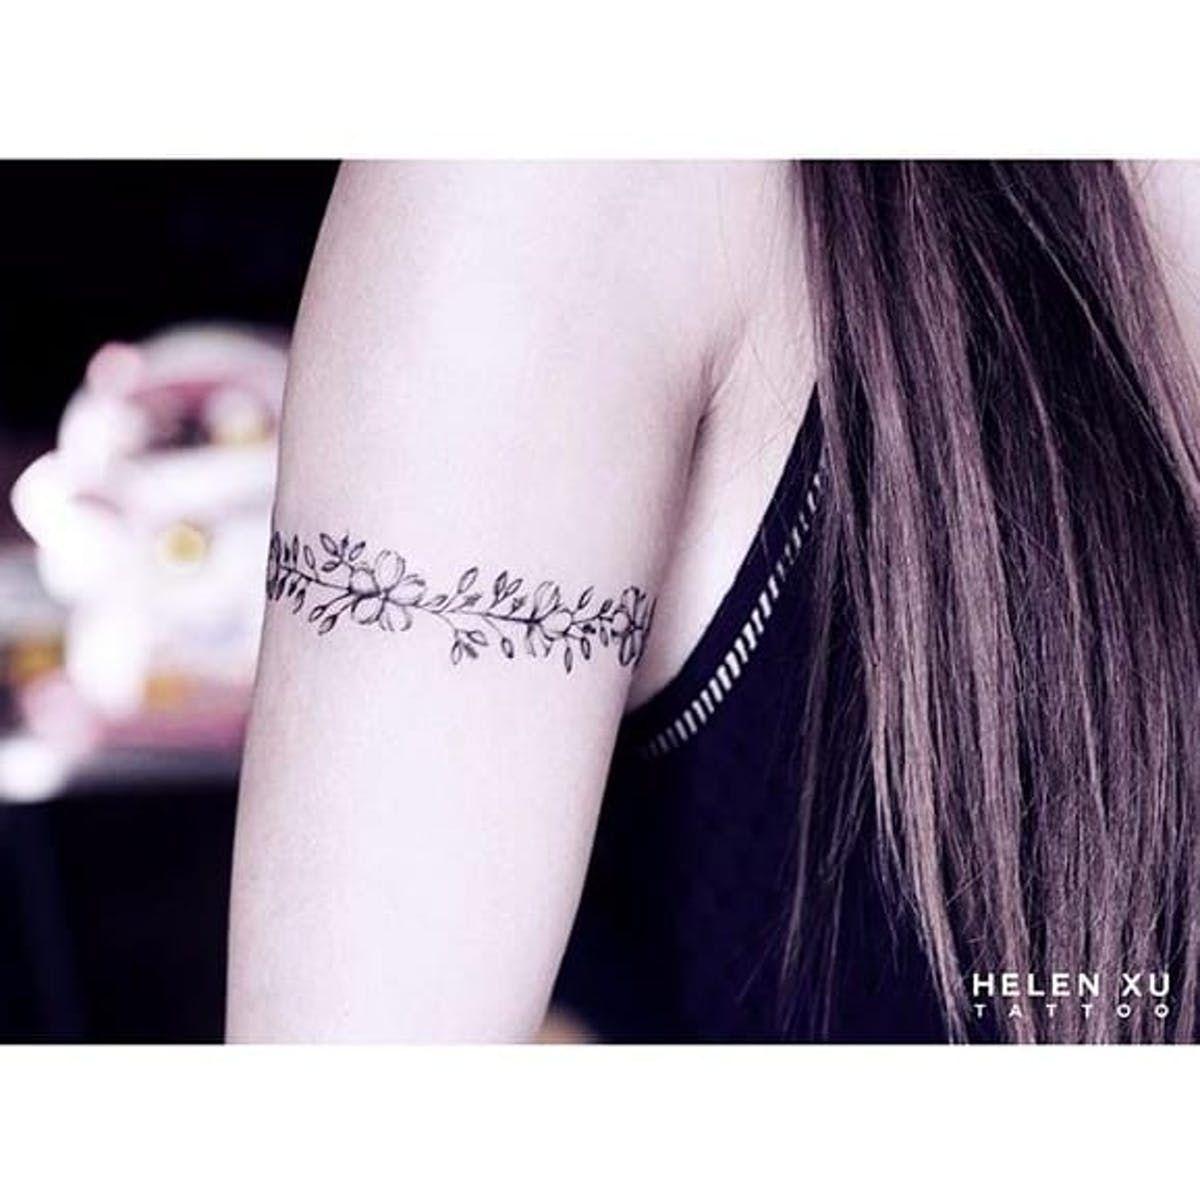 Floral armband tattoo by Helen Xu via Instagram helenxu